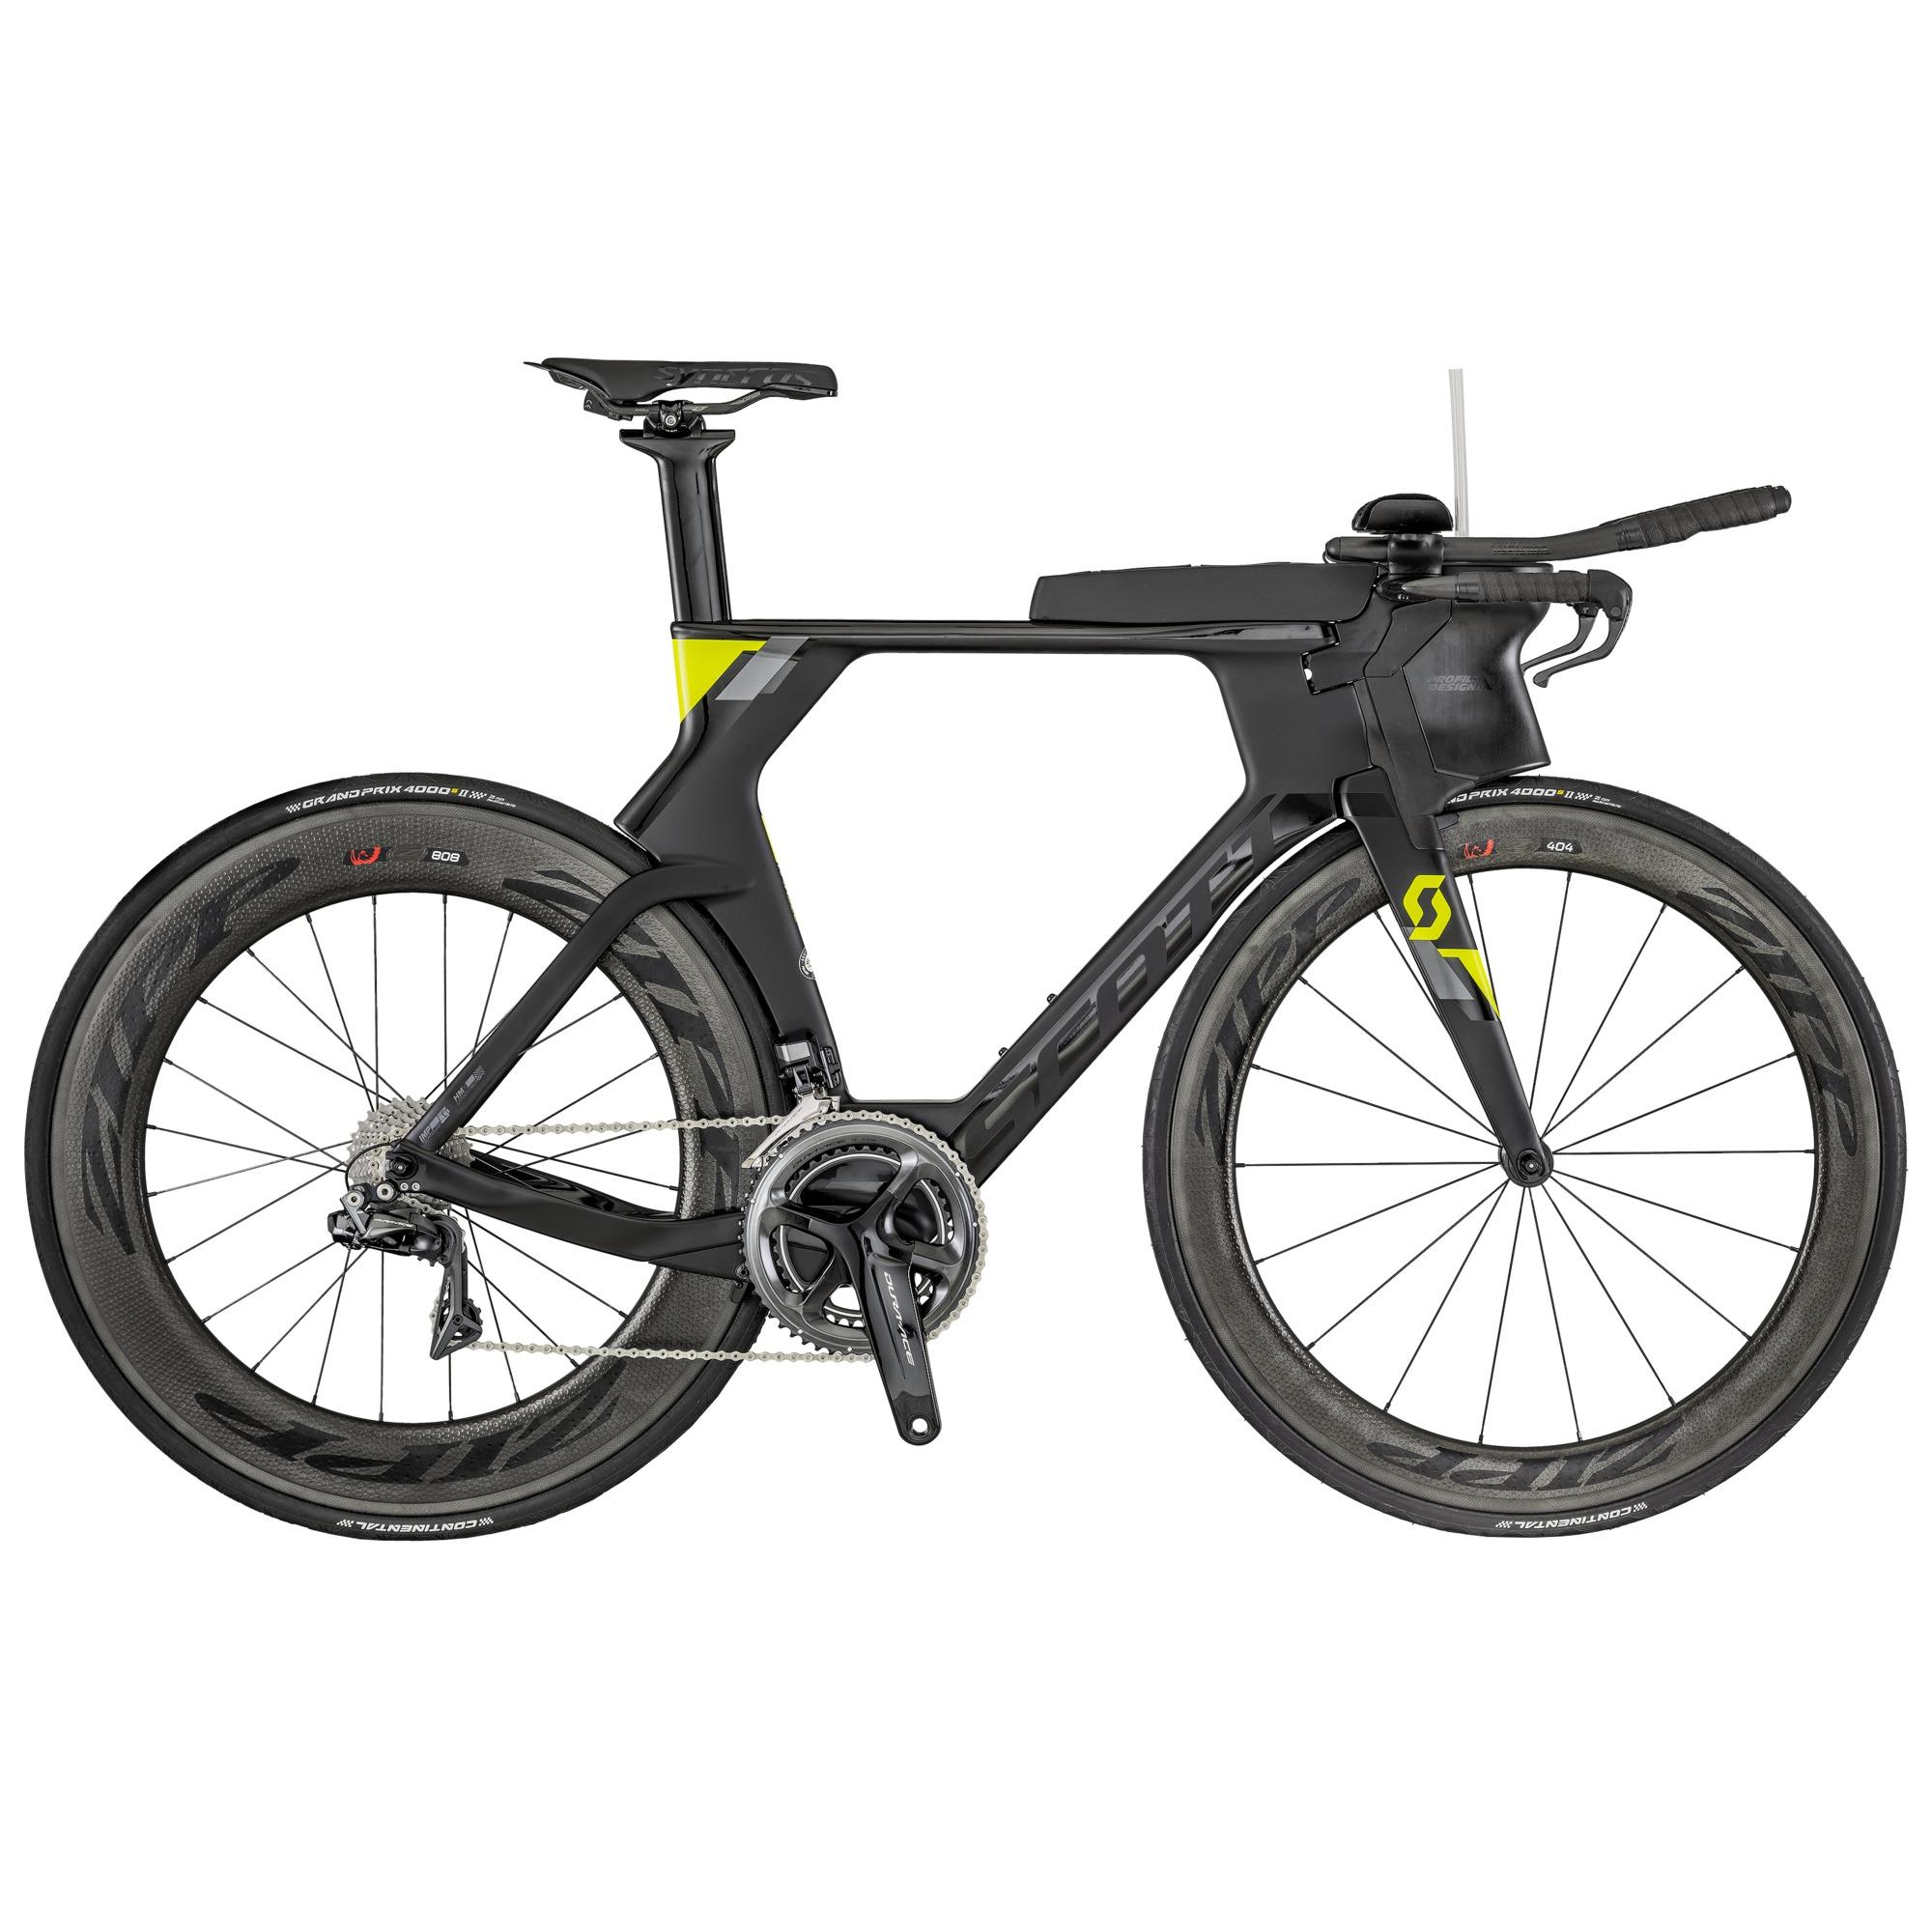 SCOTT Plasma Premium Bike M54 - Rad & Dämpferklinik GmbH